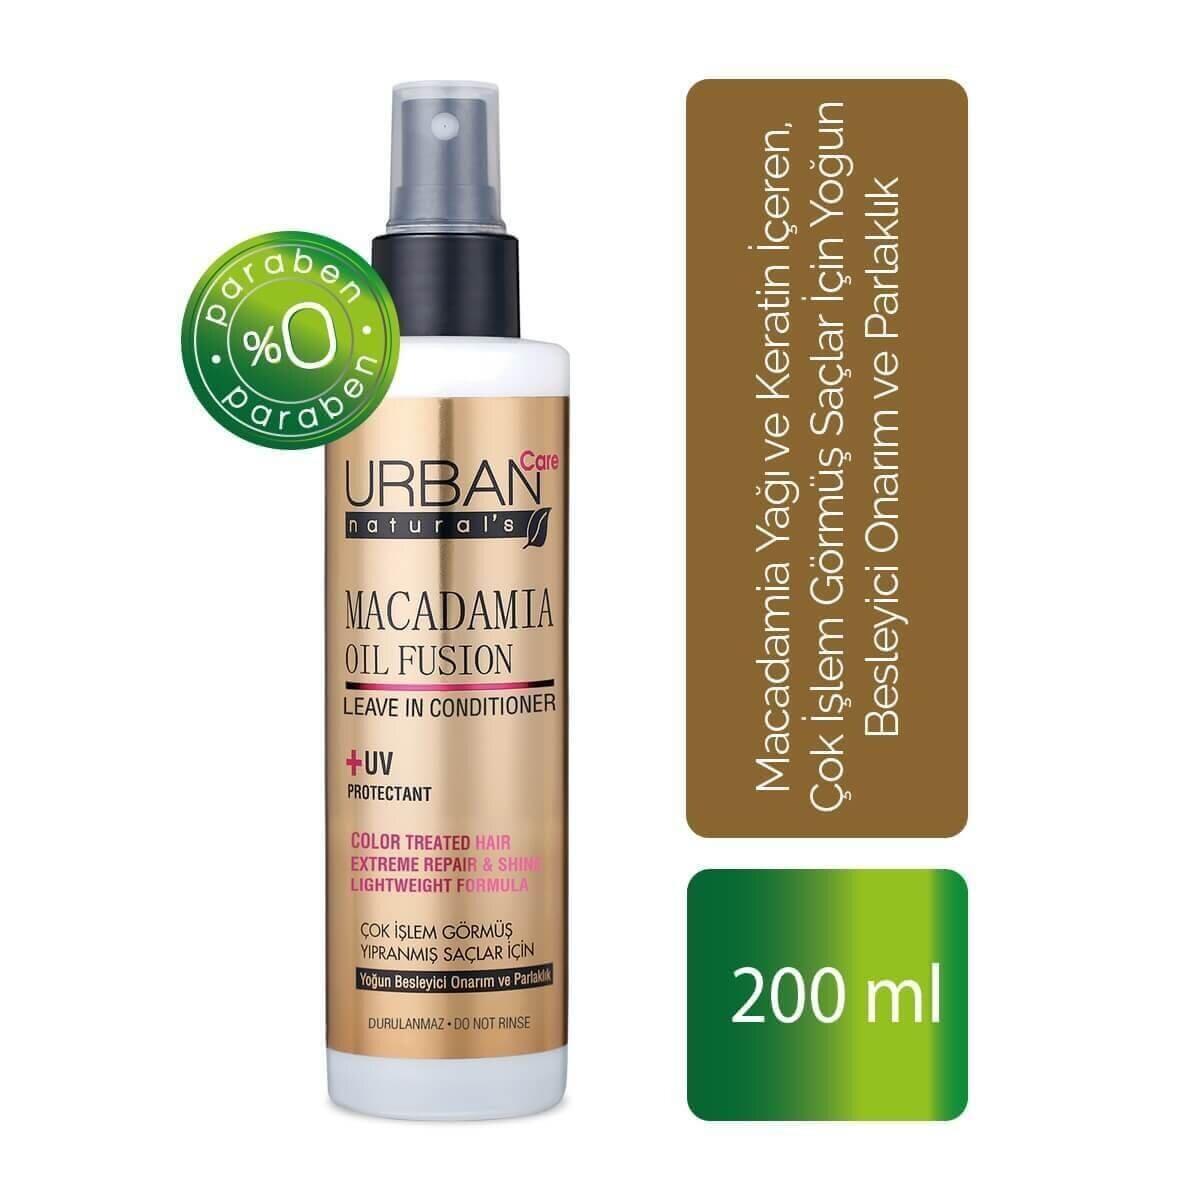 Macadamia Oil Fusion Sıvı Saç Kremi 200ml